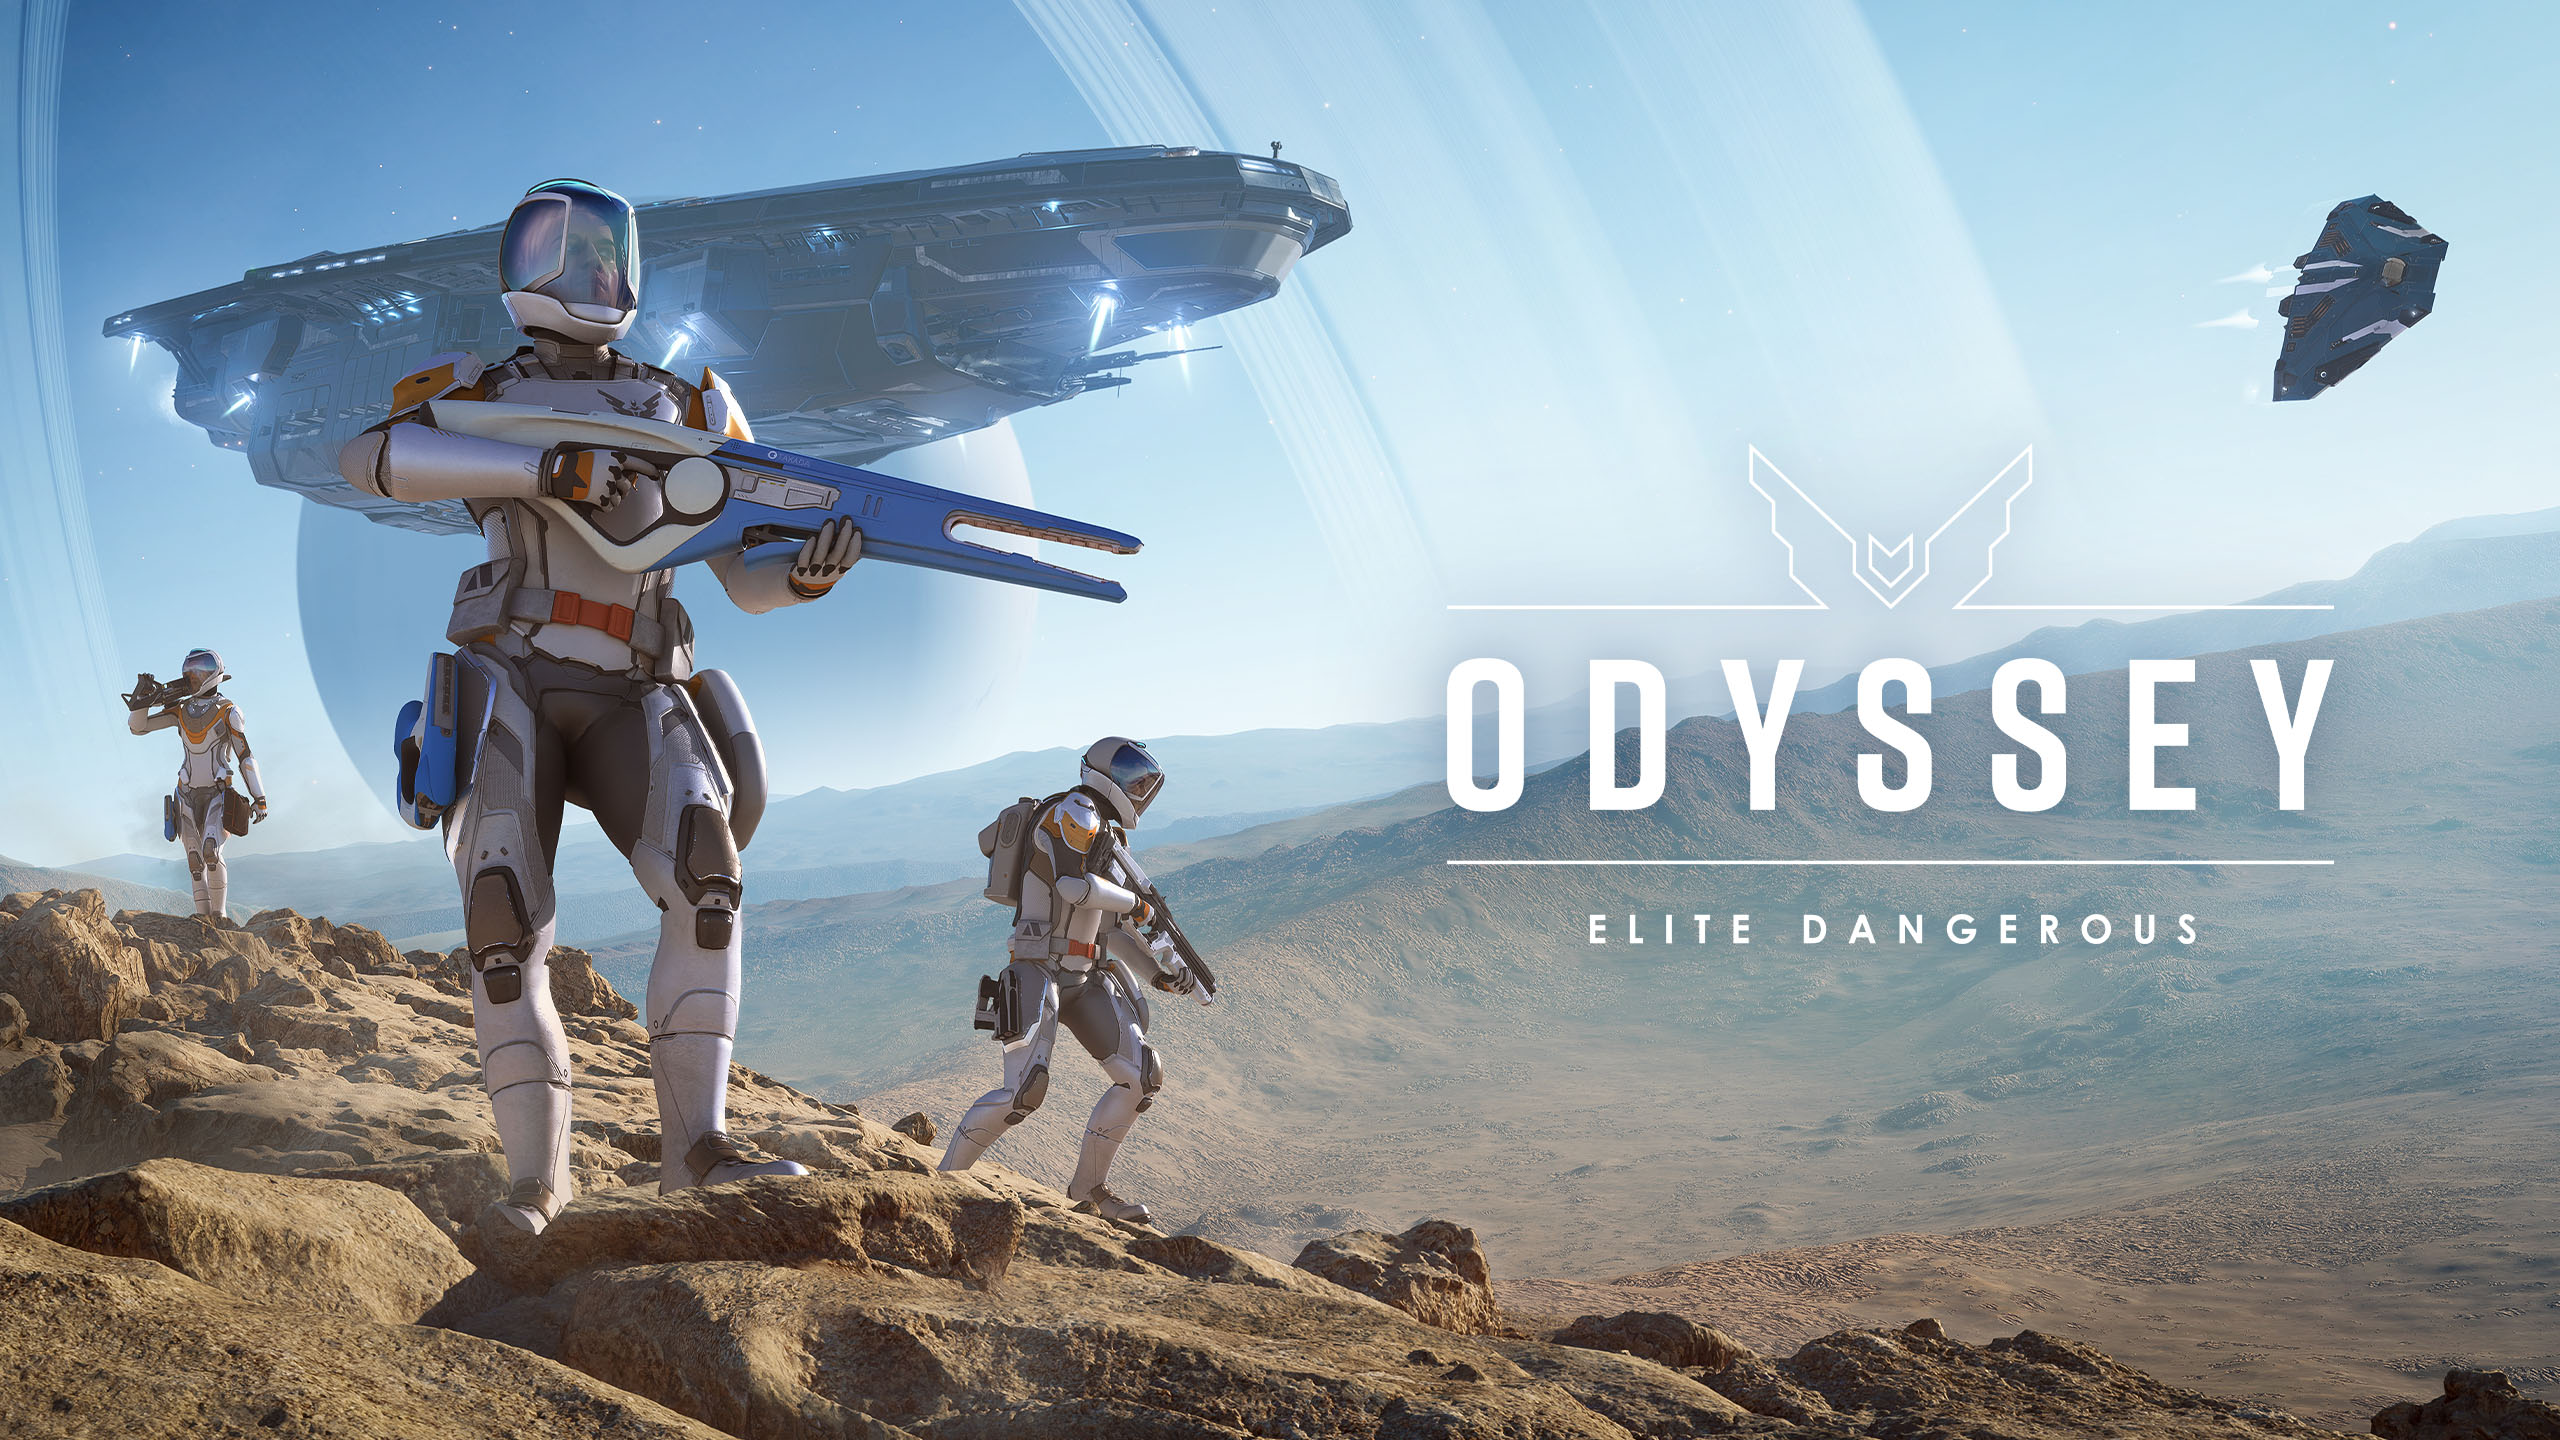 Elite Dangerous Rocketing onto PlayStation 4 in Q2 of 2017